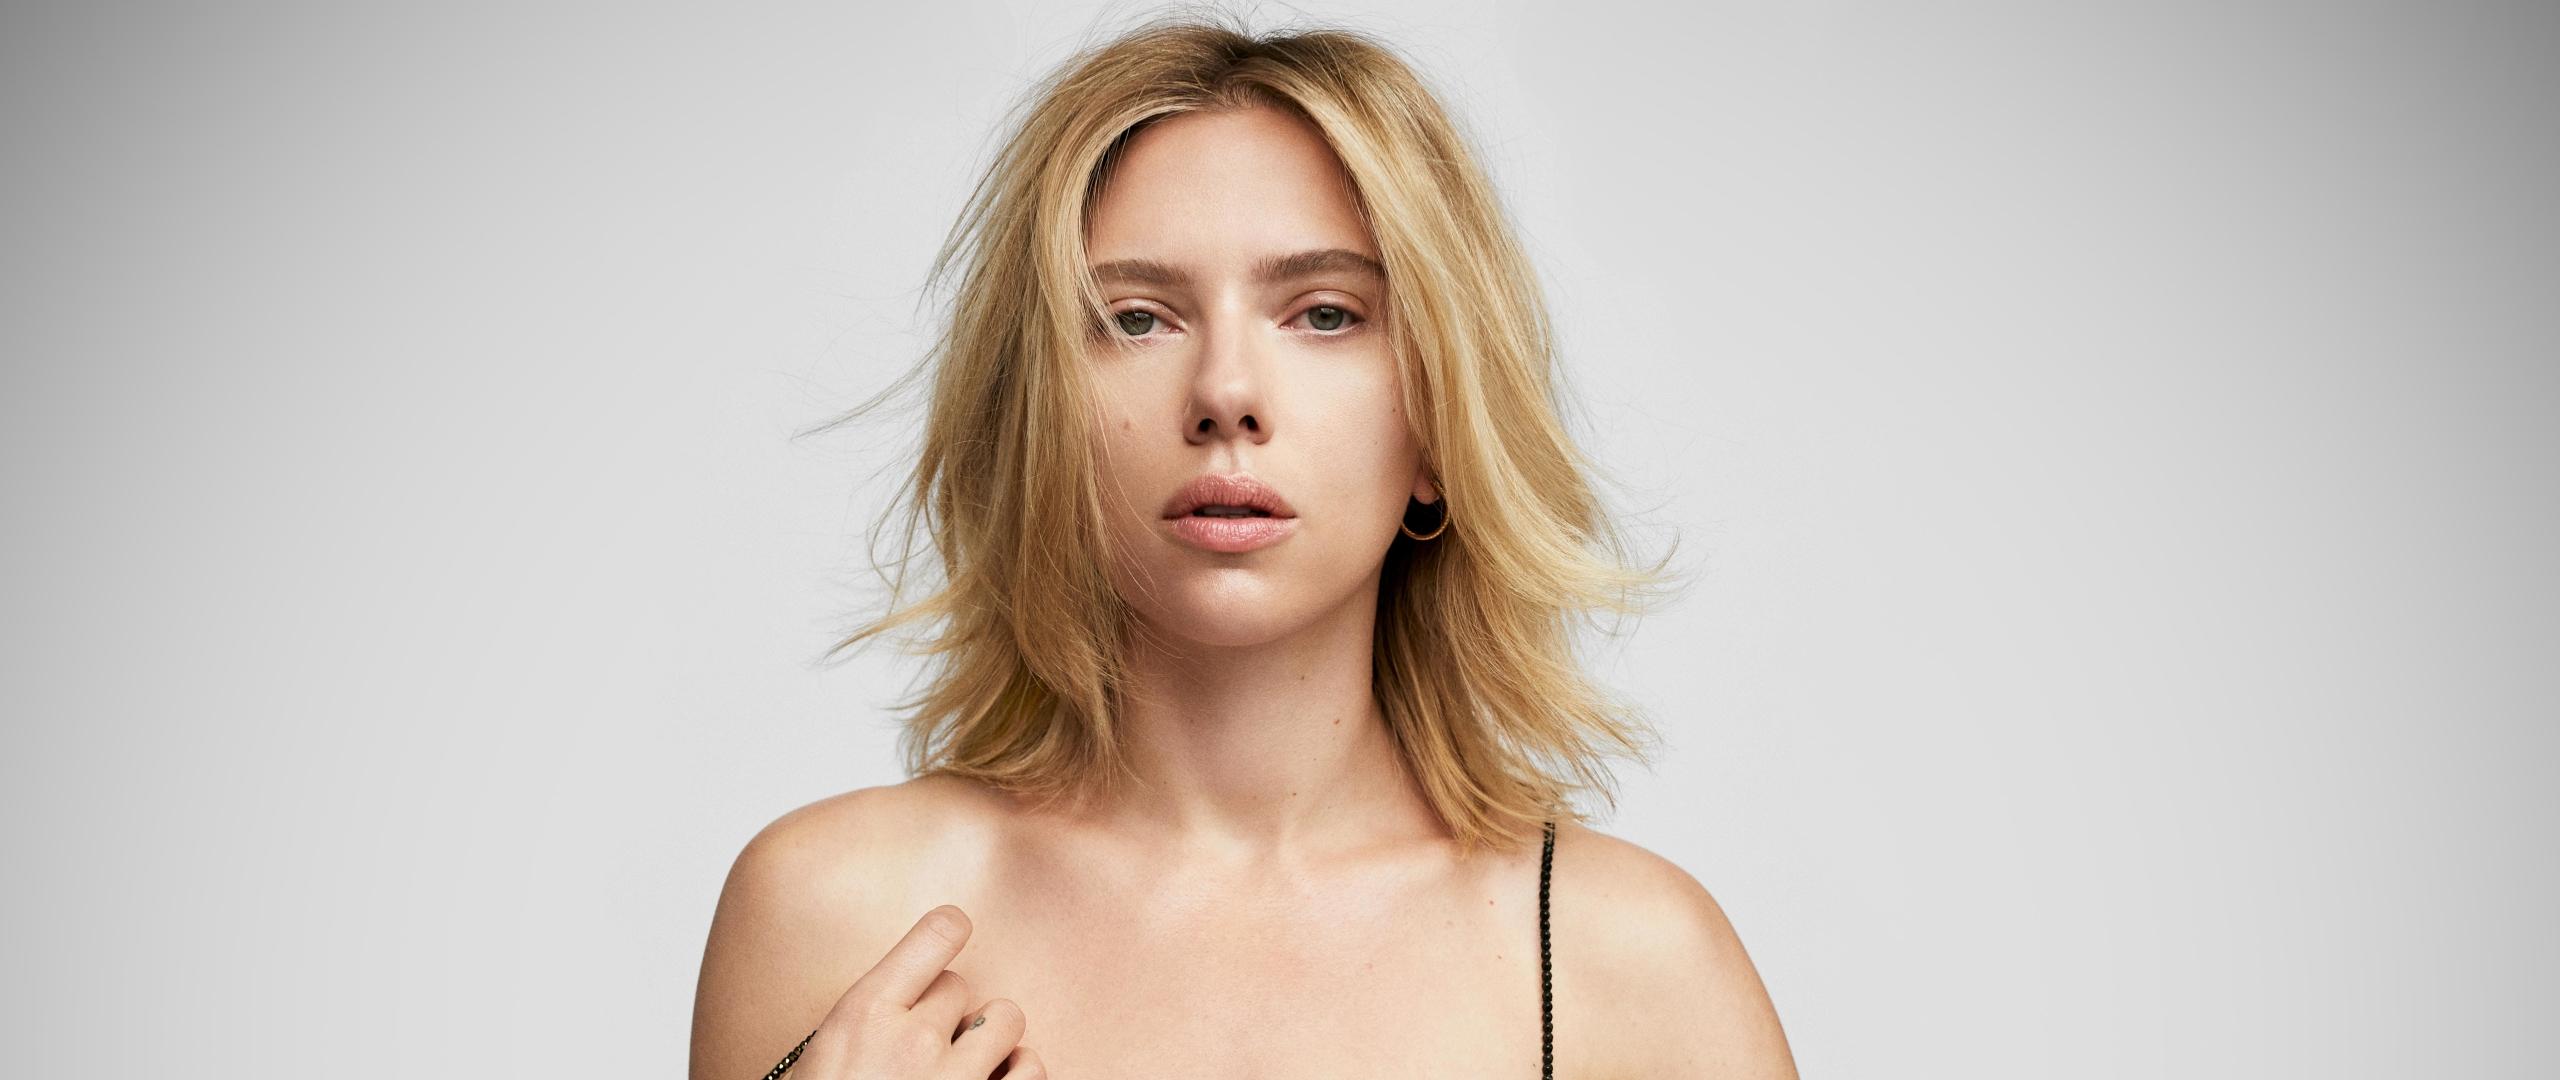 2560x1080 Scarlett Johansson 2020 2560x1080 Resolution ...